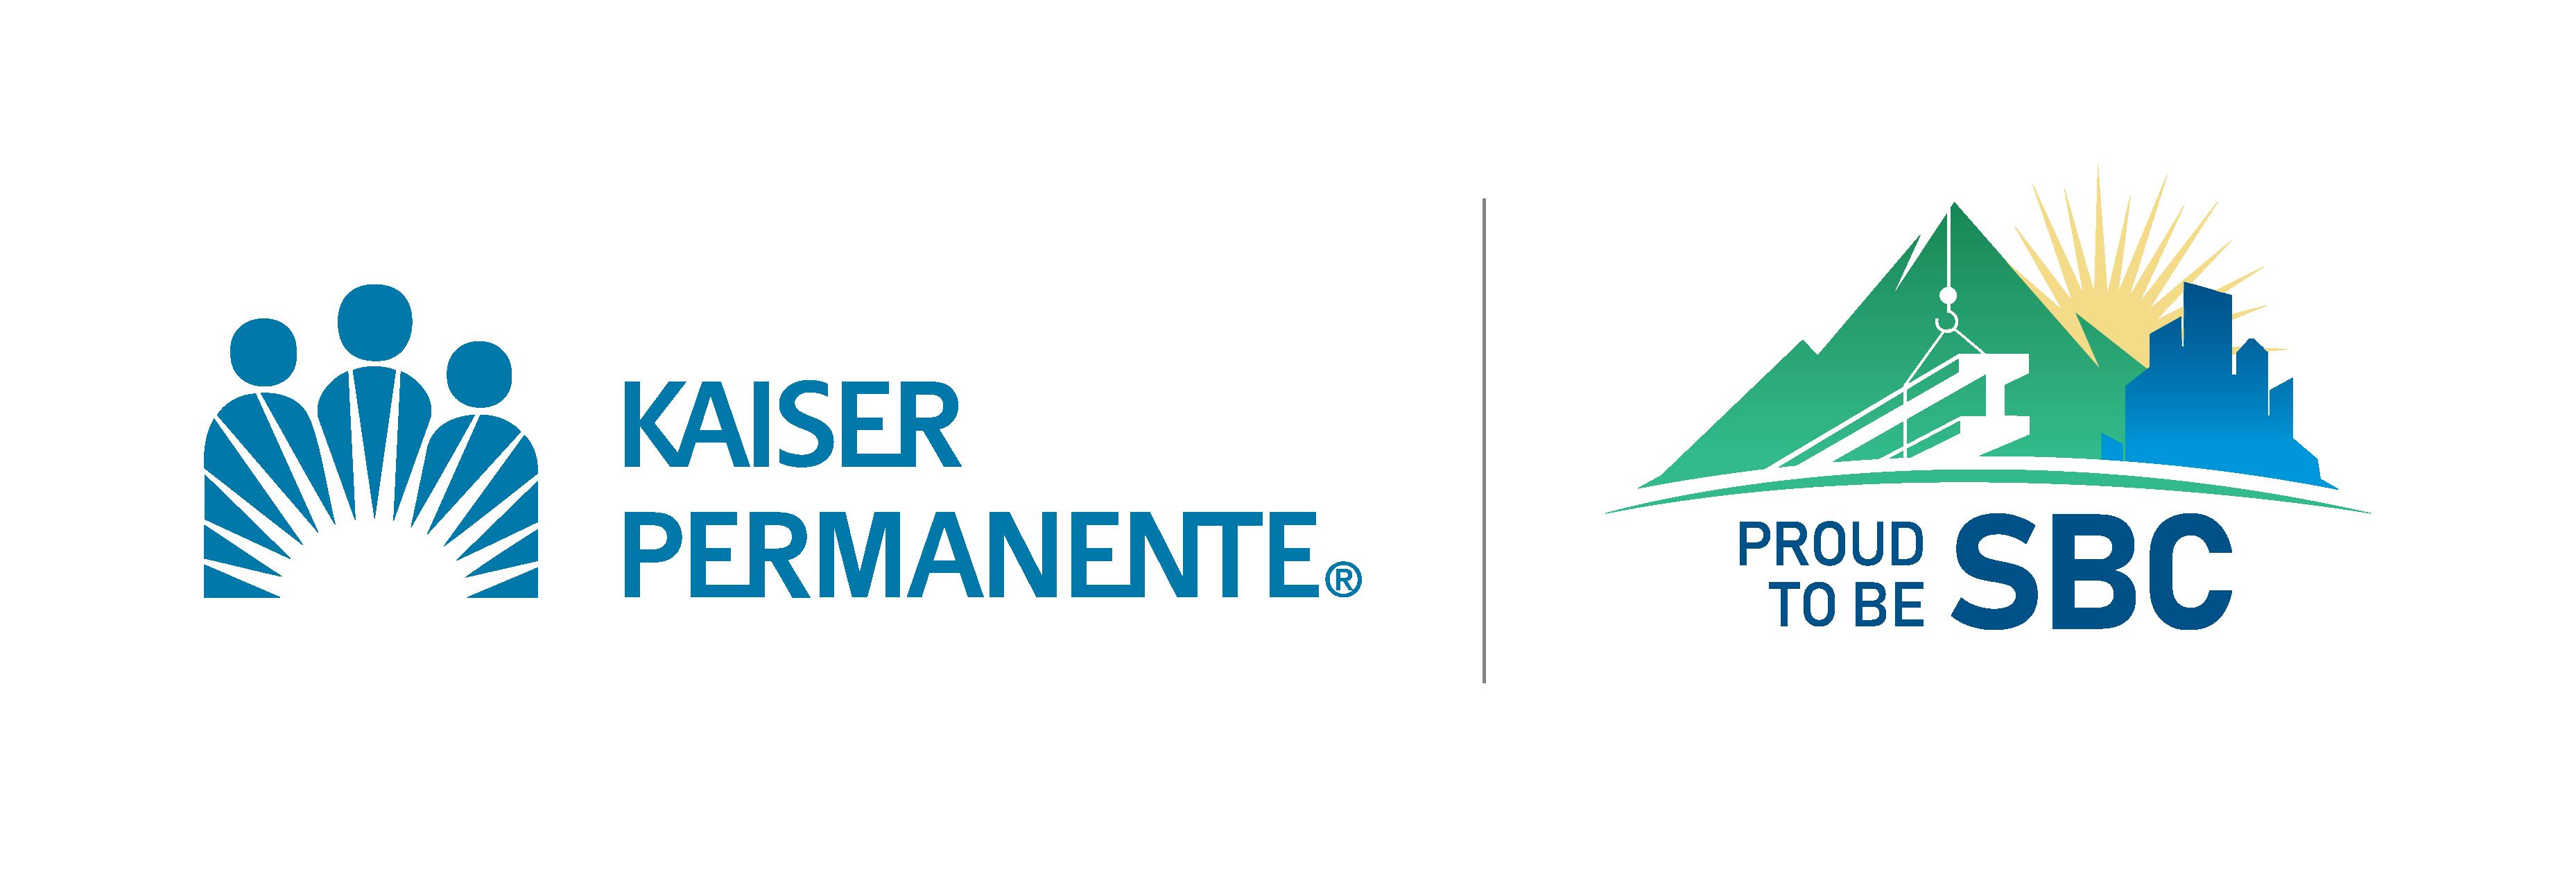 KP SBC Logo Lockup 4c-01